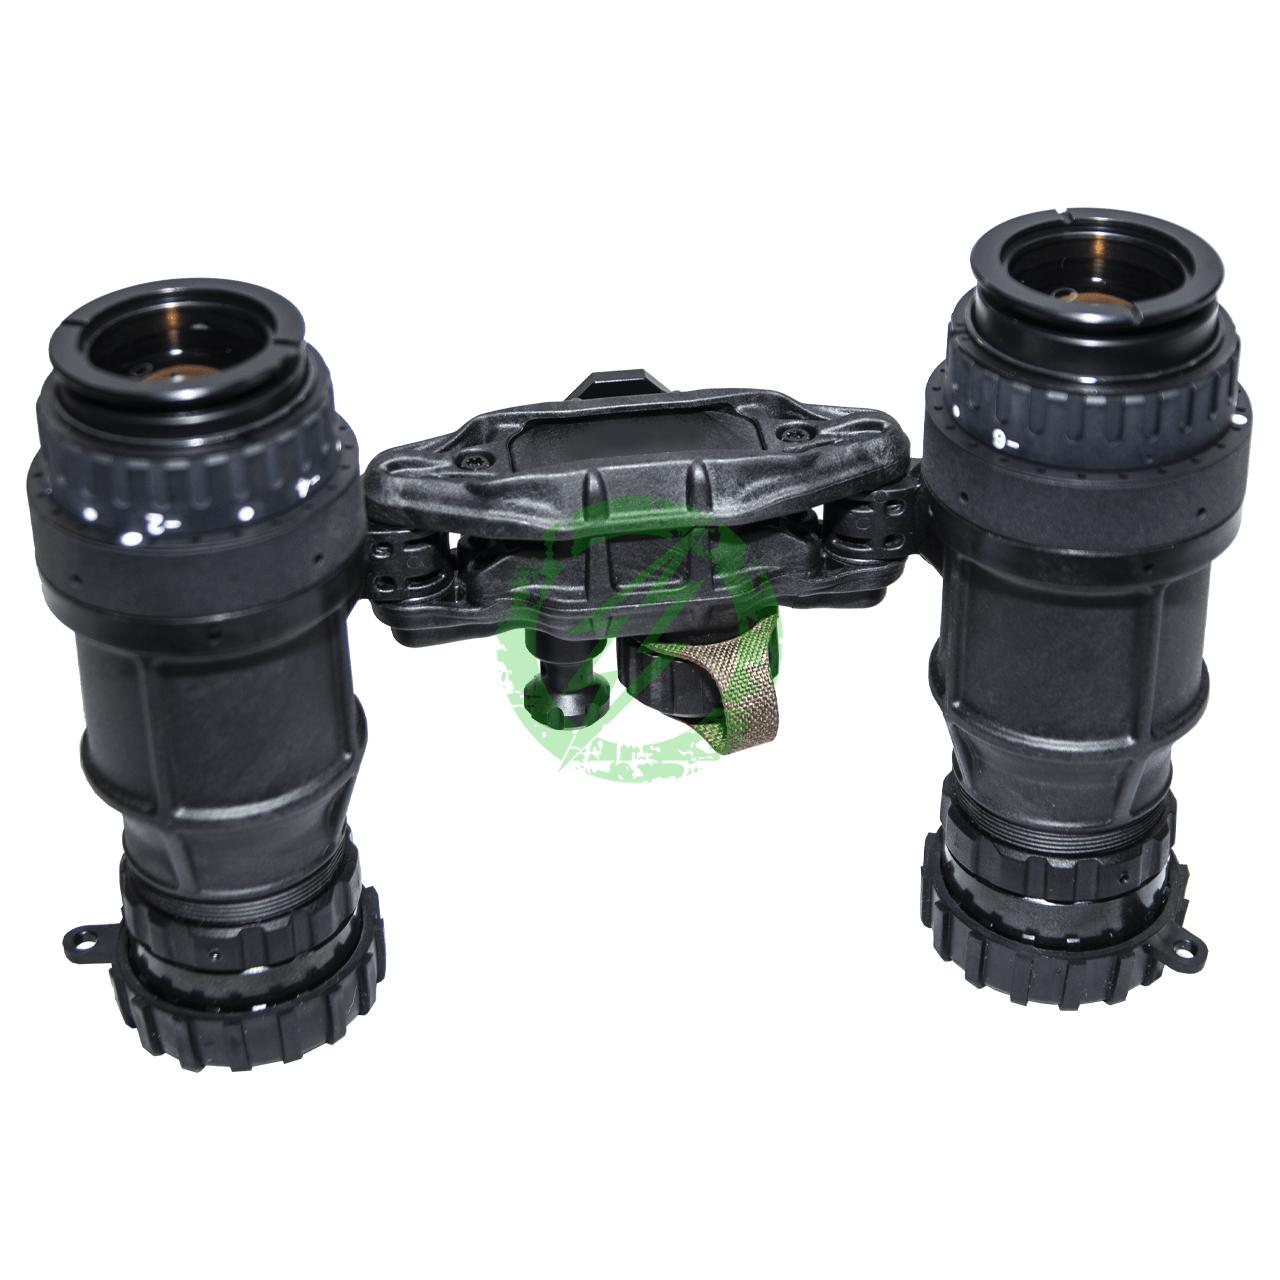 4G ECHO White Phosphor ACT DTNVS-14 Binocular Night Vision Device Bottom